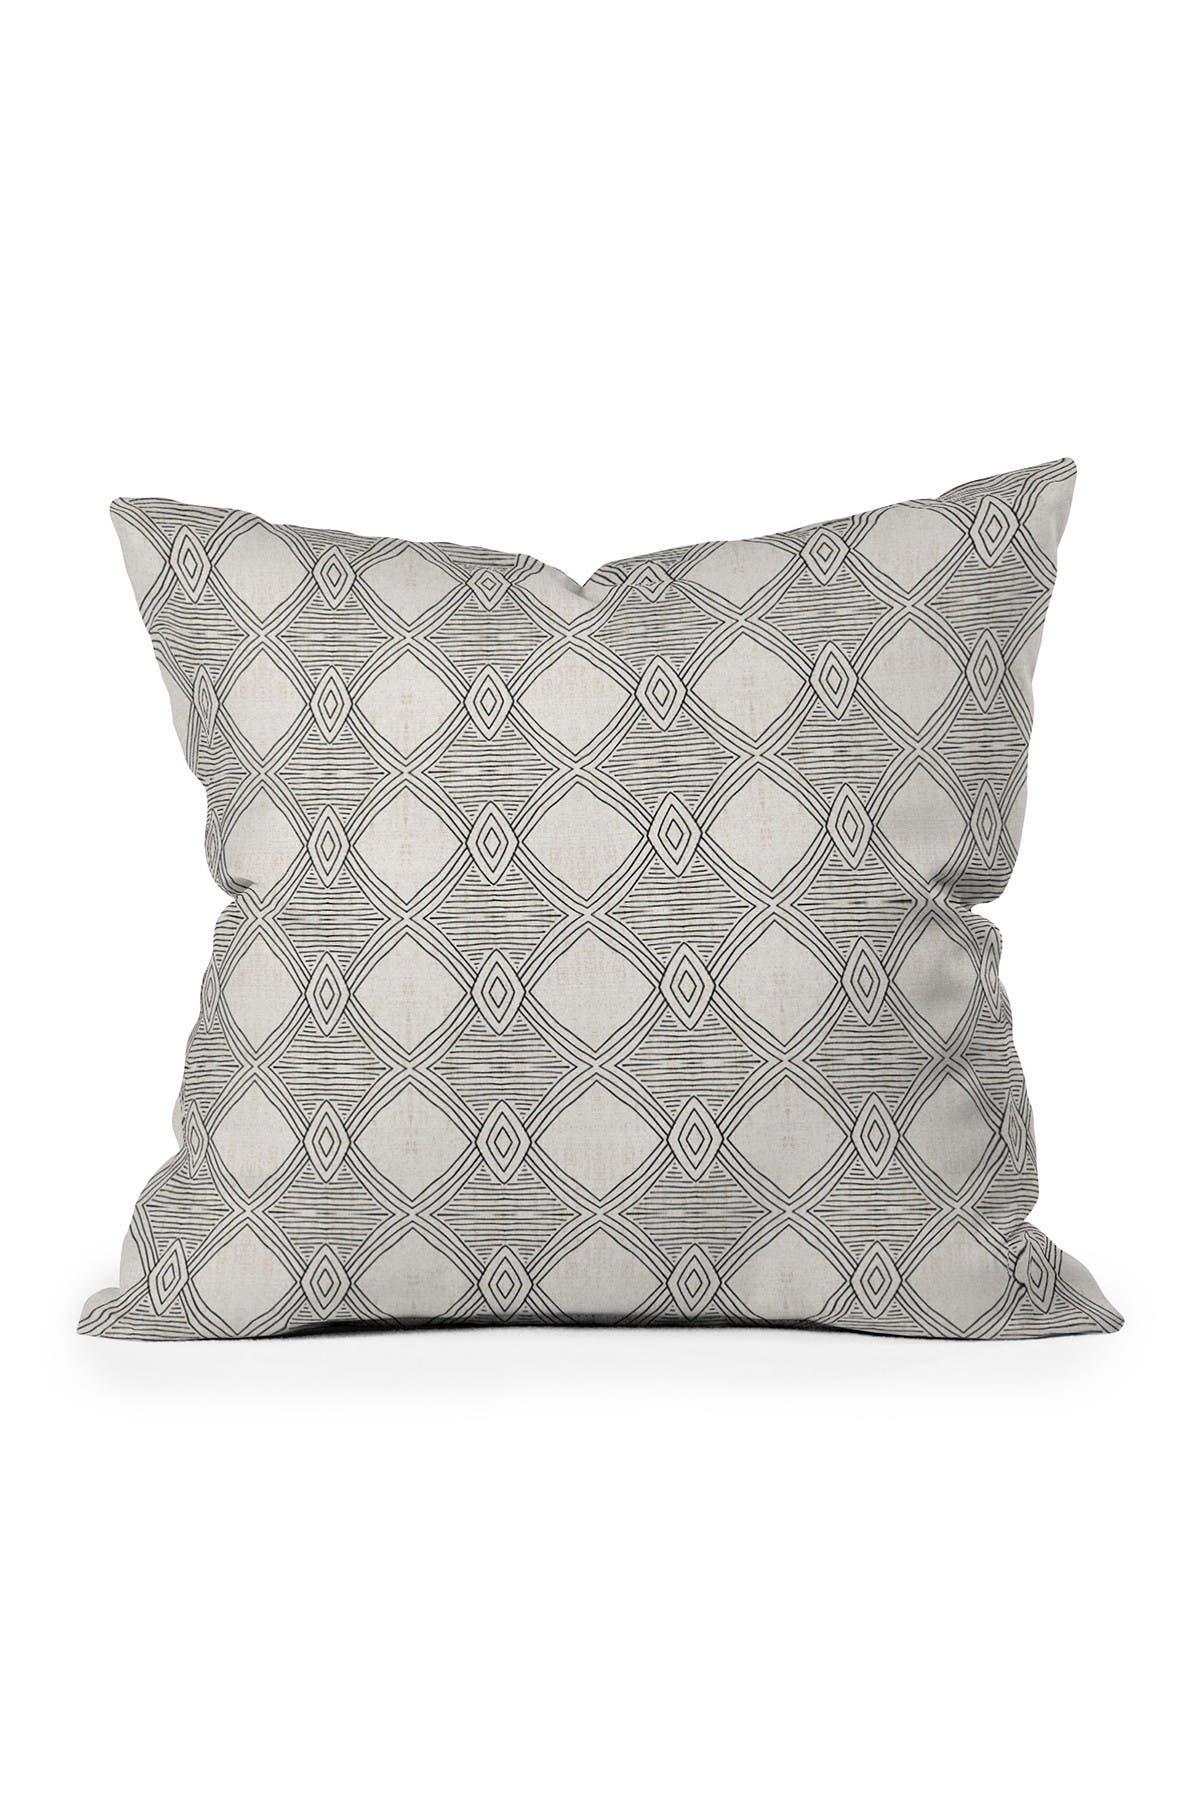 Image of Deny Designs Holli Zollinger Playa Diamond Square Throw Pillow